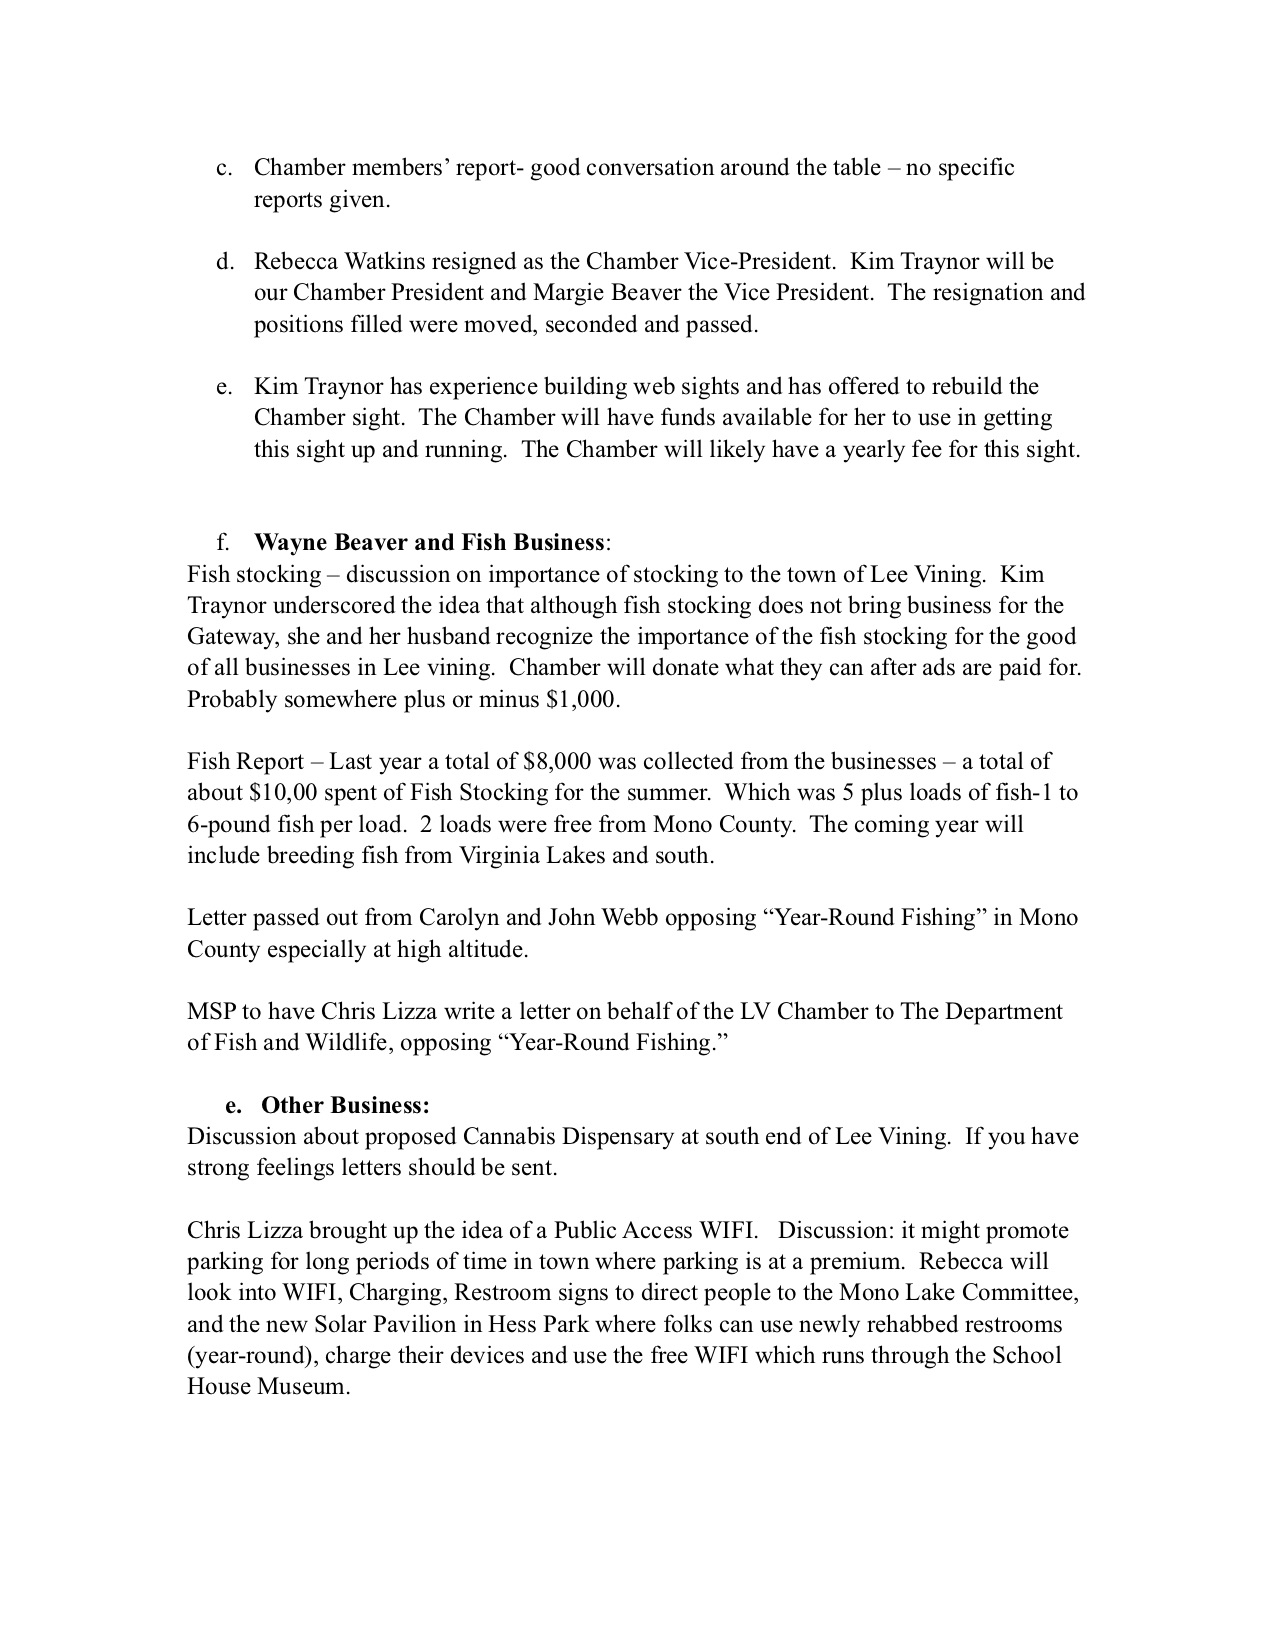 LVCC Minutes2 - April 2019.jpg